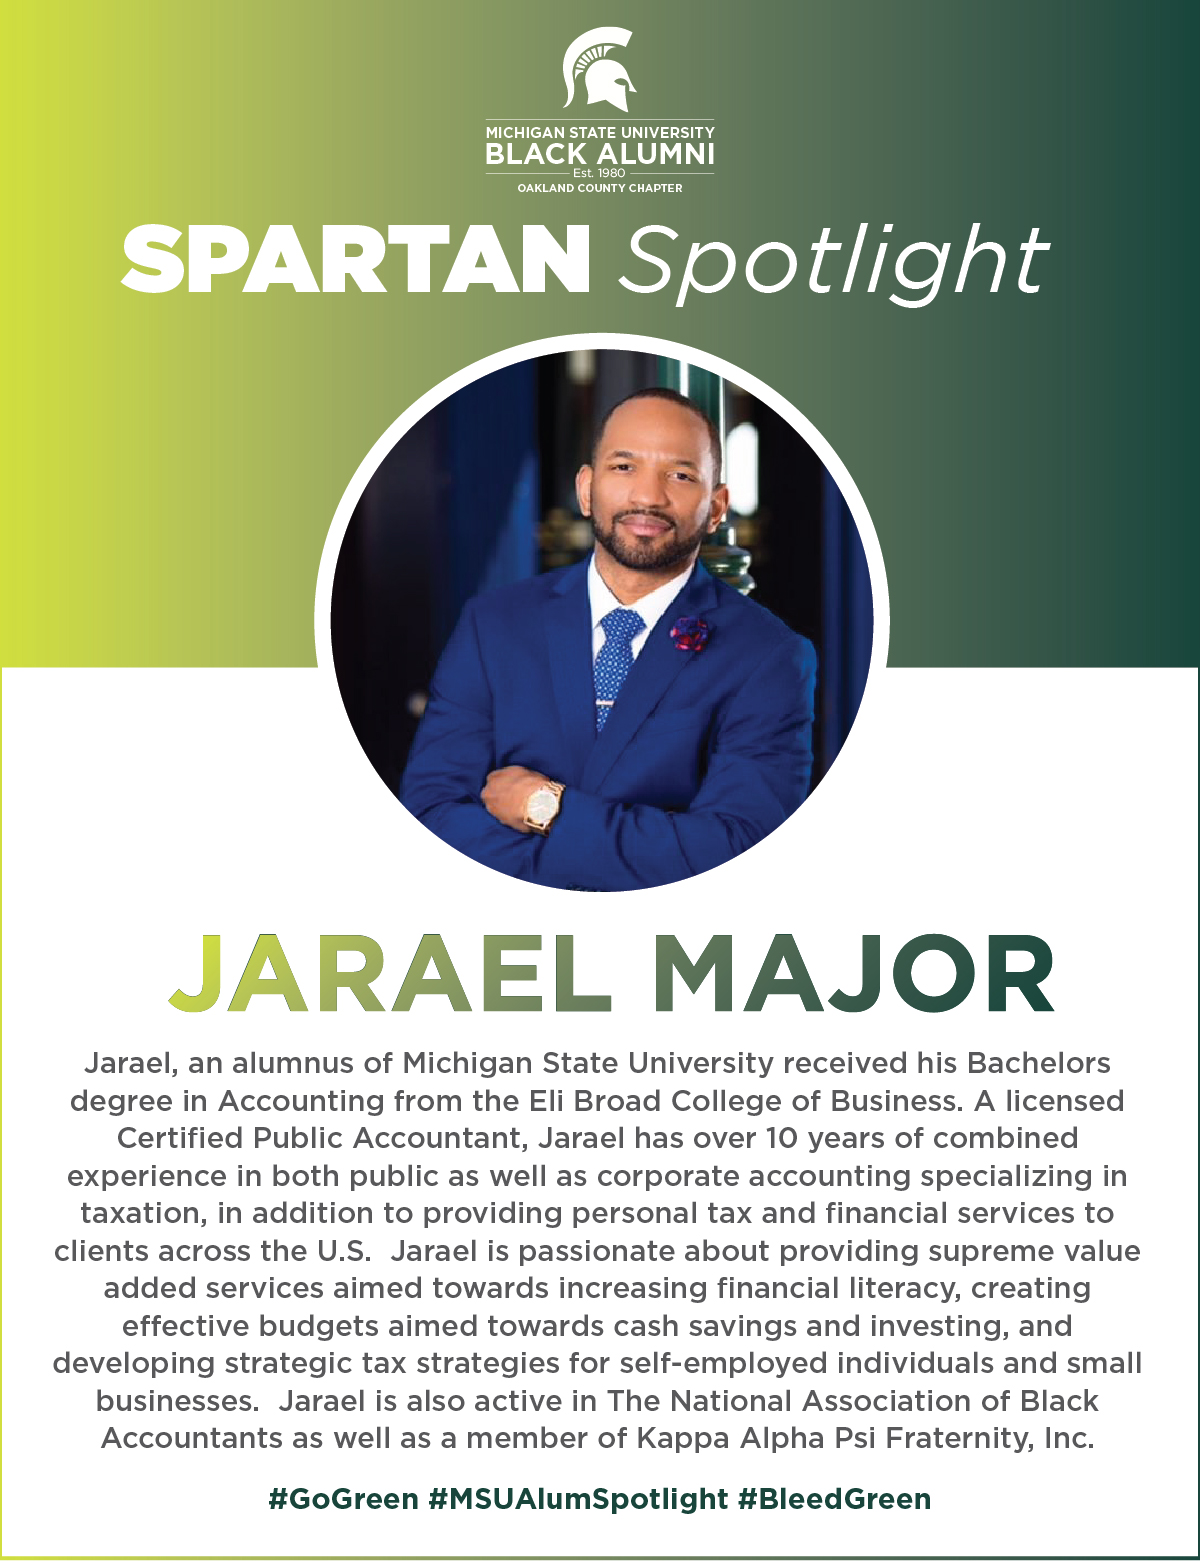 MSUBAOC Spartan Spotlight Jarael Major(I